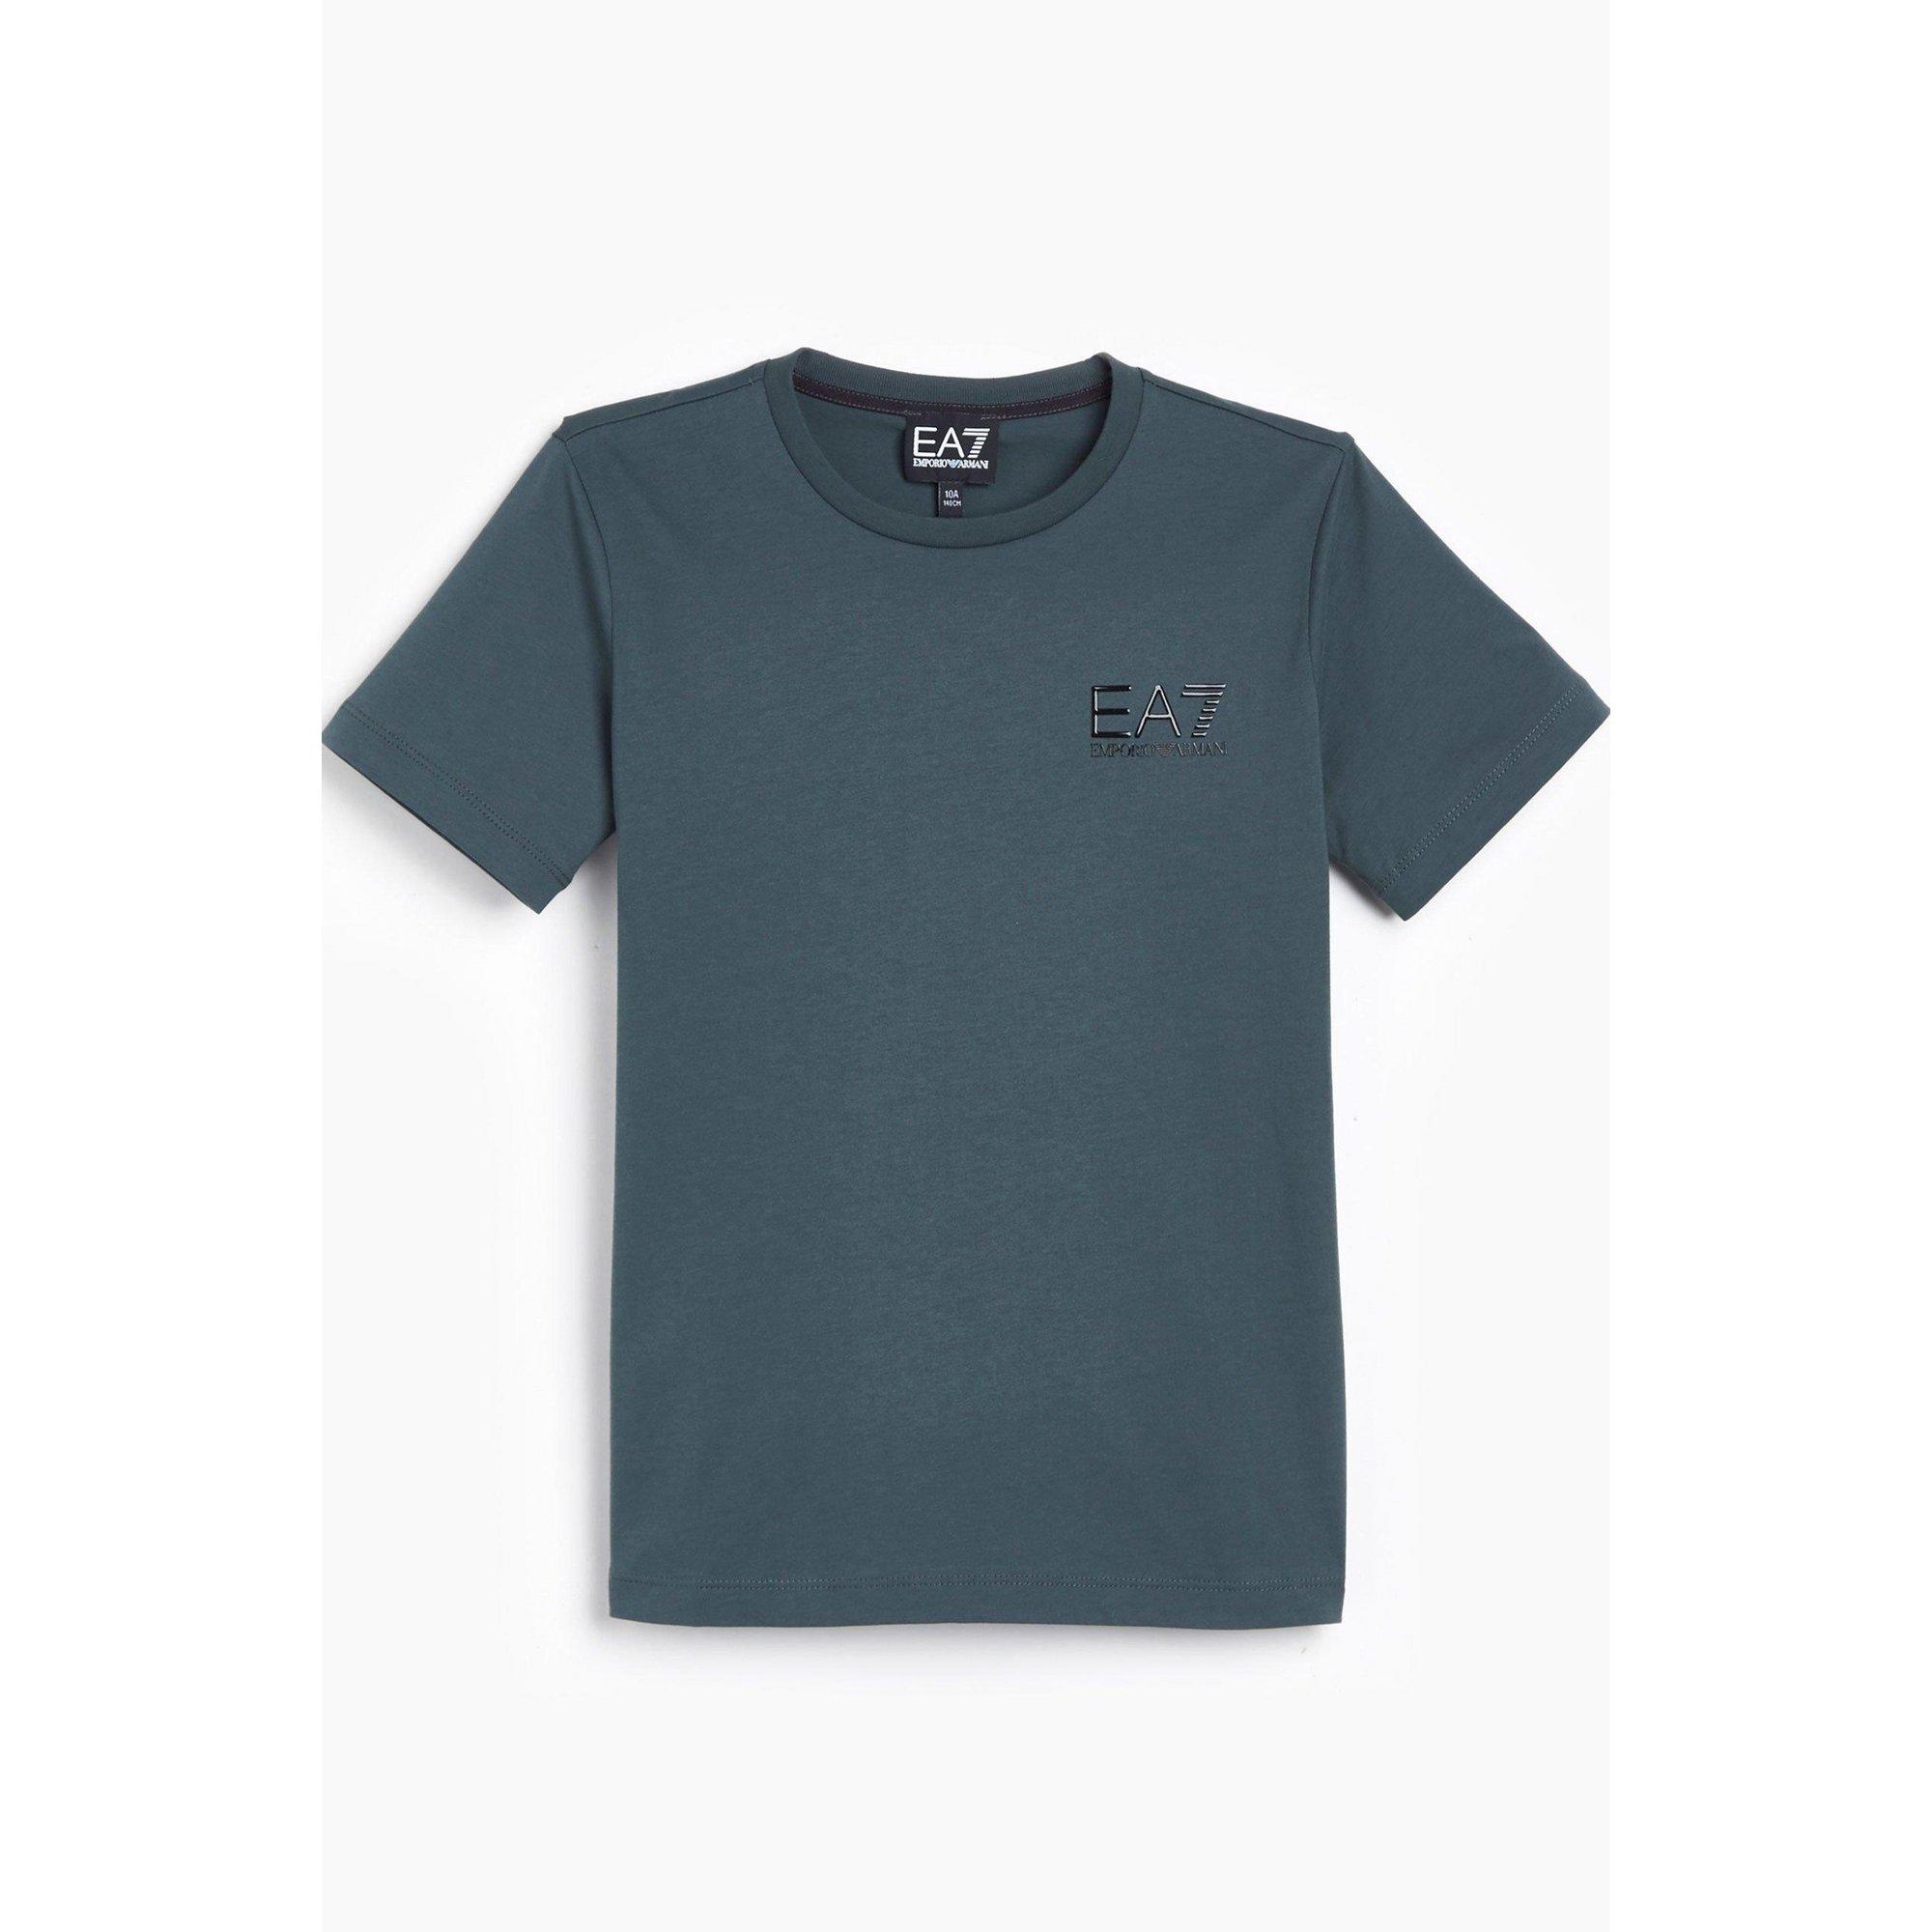 Image of Boys EA7 Train Core ID Grey T-Shirt